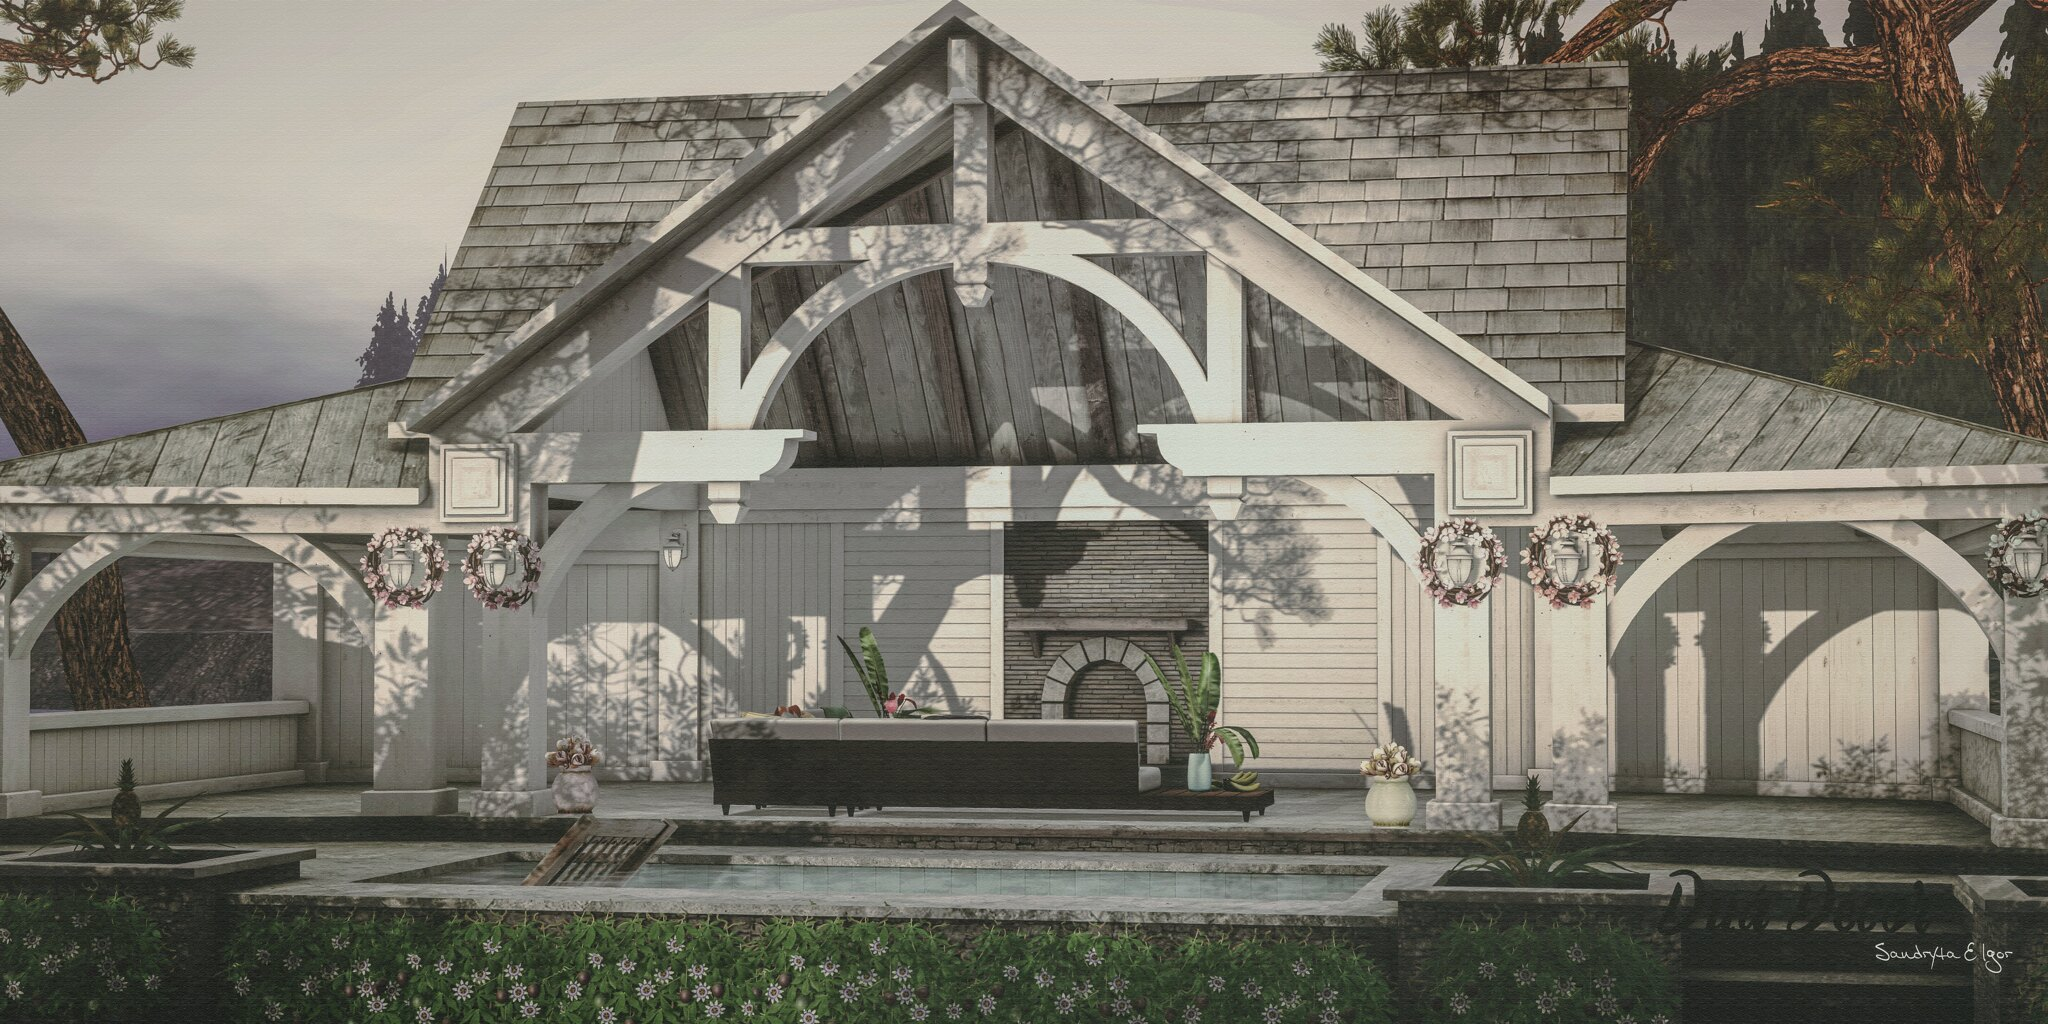 POST🔥 #605   Trompe Loeil   SAYO   Ariskea   Serenity Style   Fameshed   The Liaison Collaborative